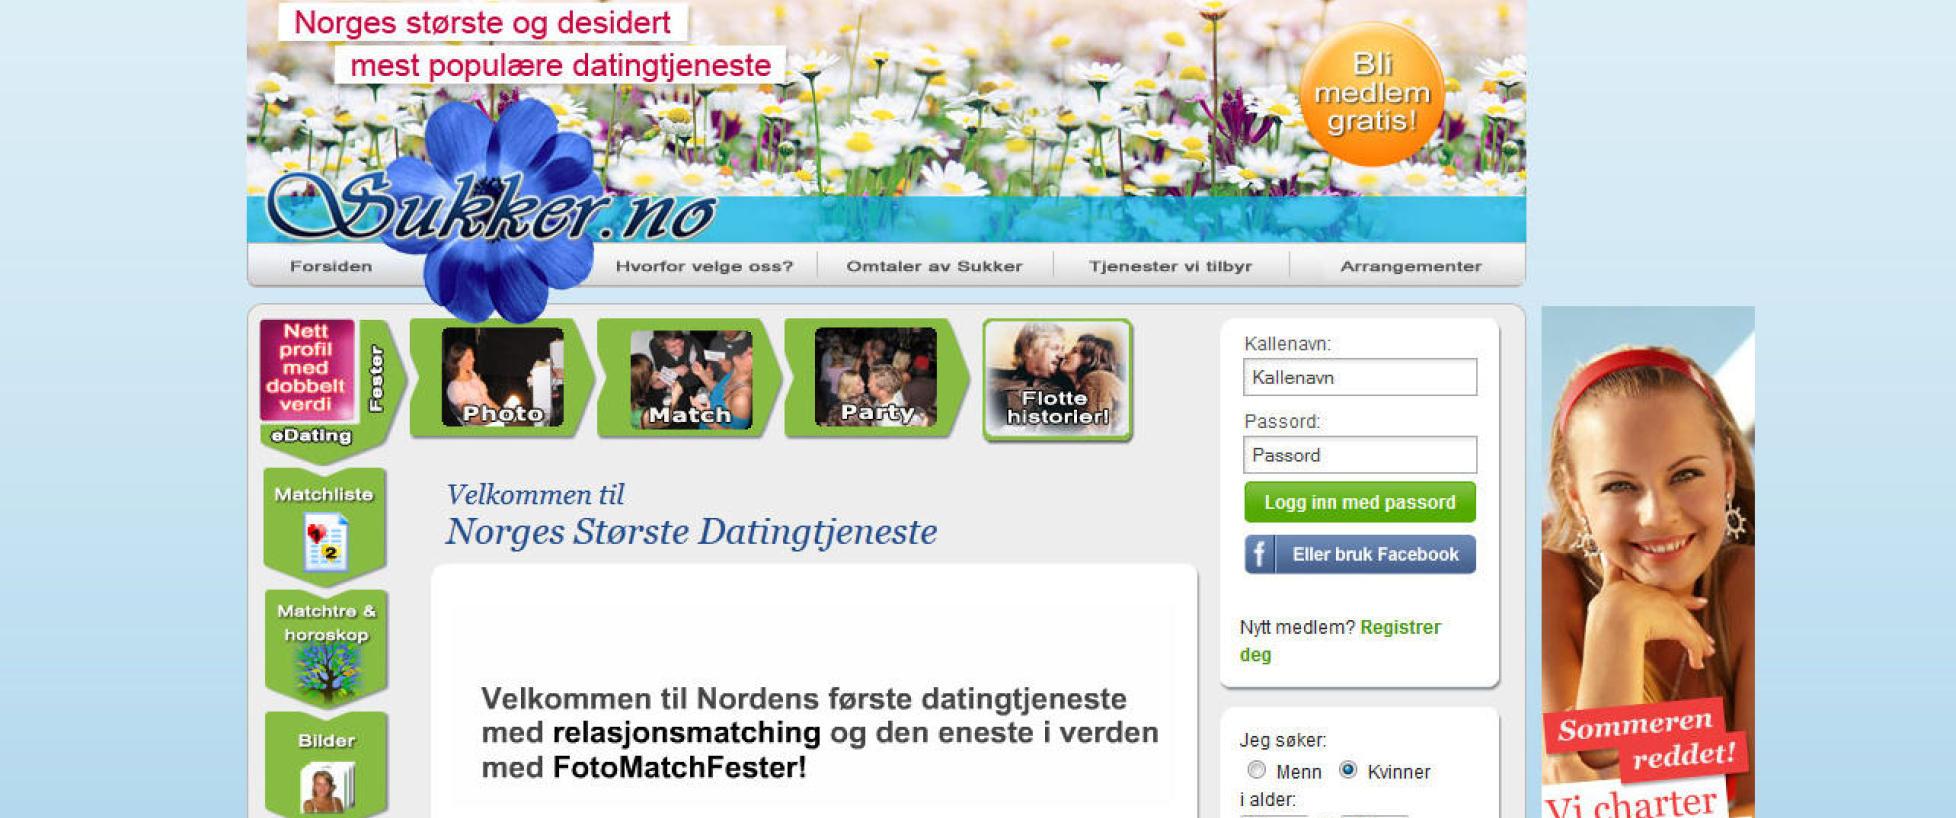 norges største dating site Elverum